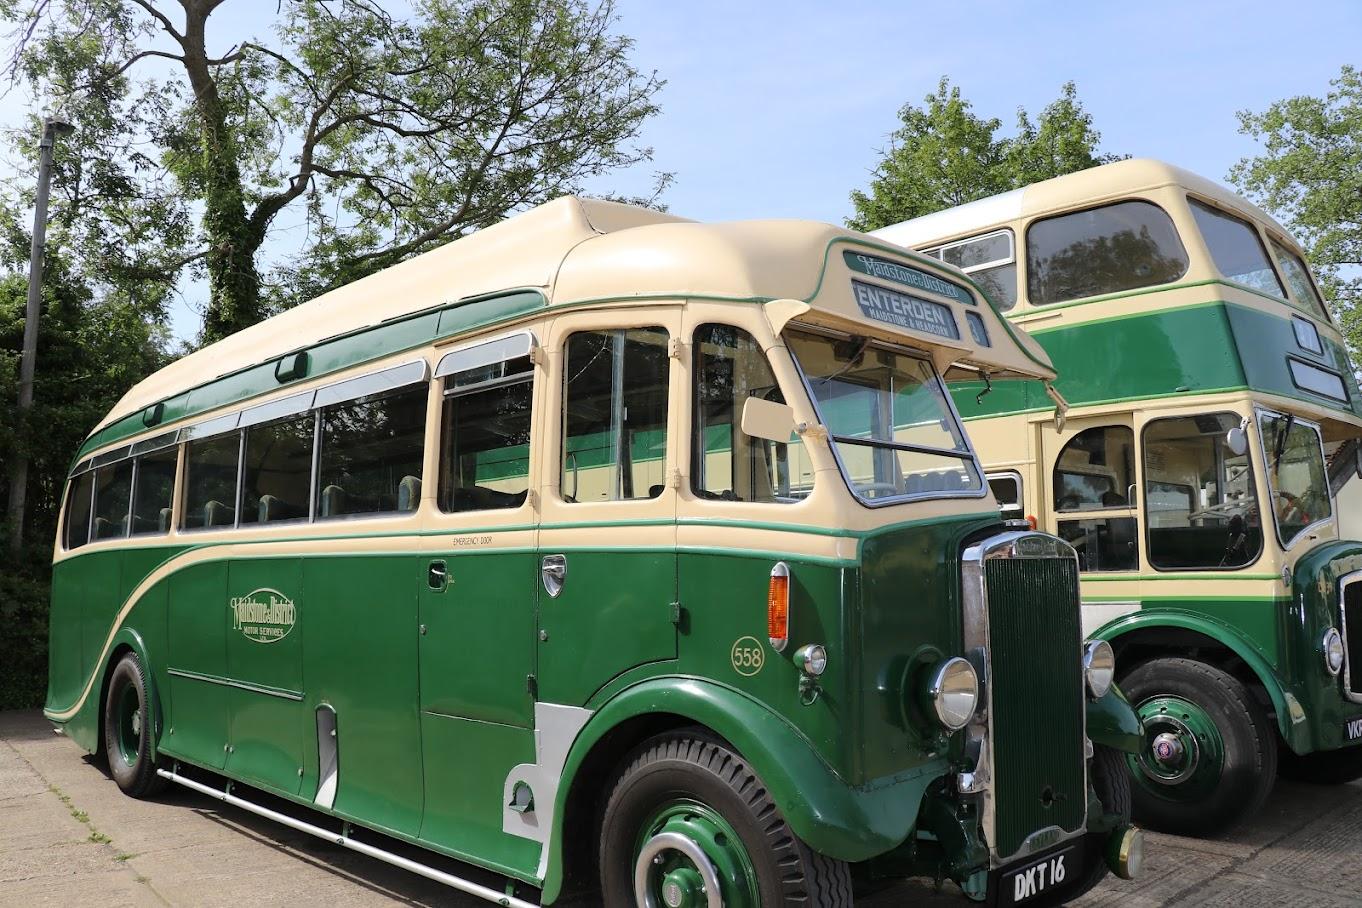 Tenterden Bus Rally 2018 Tenterden Town Station